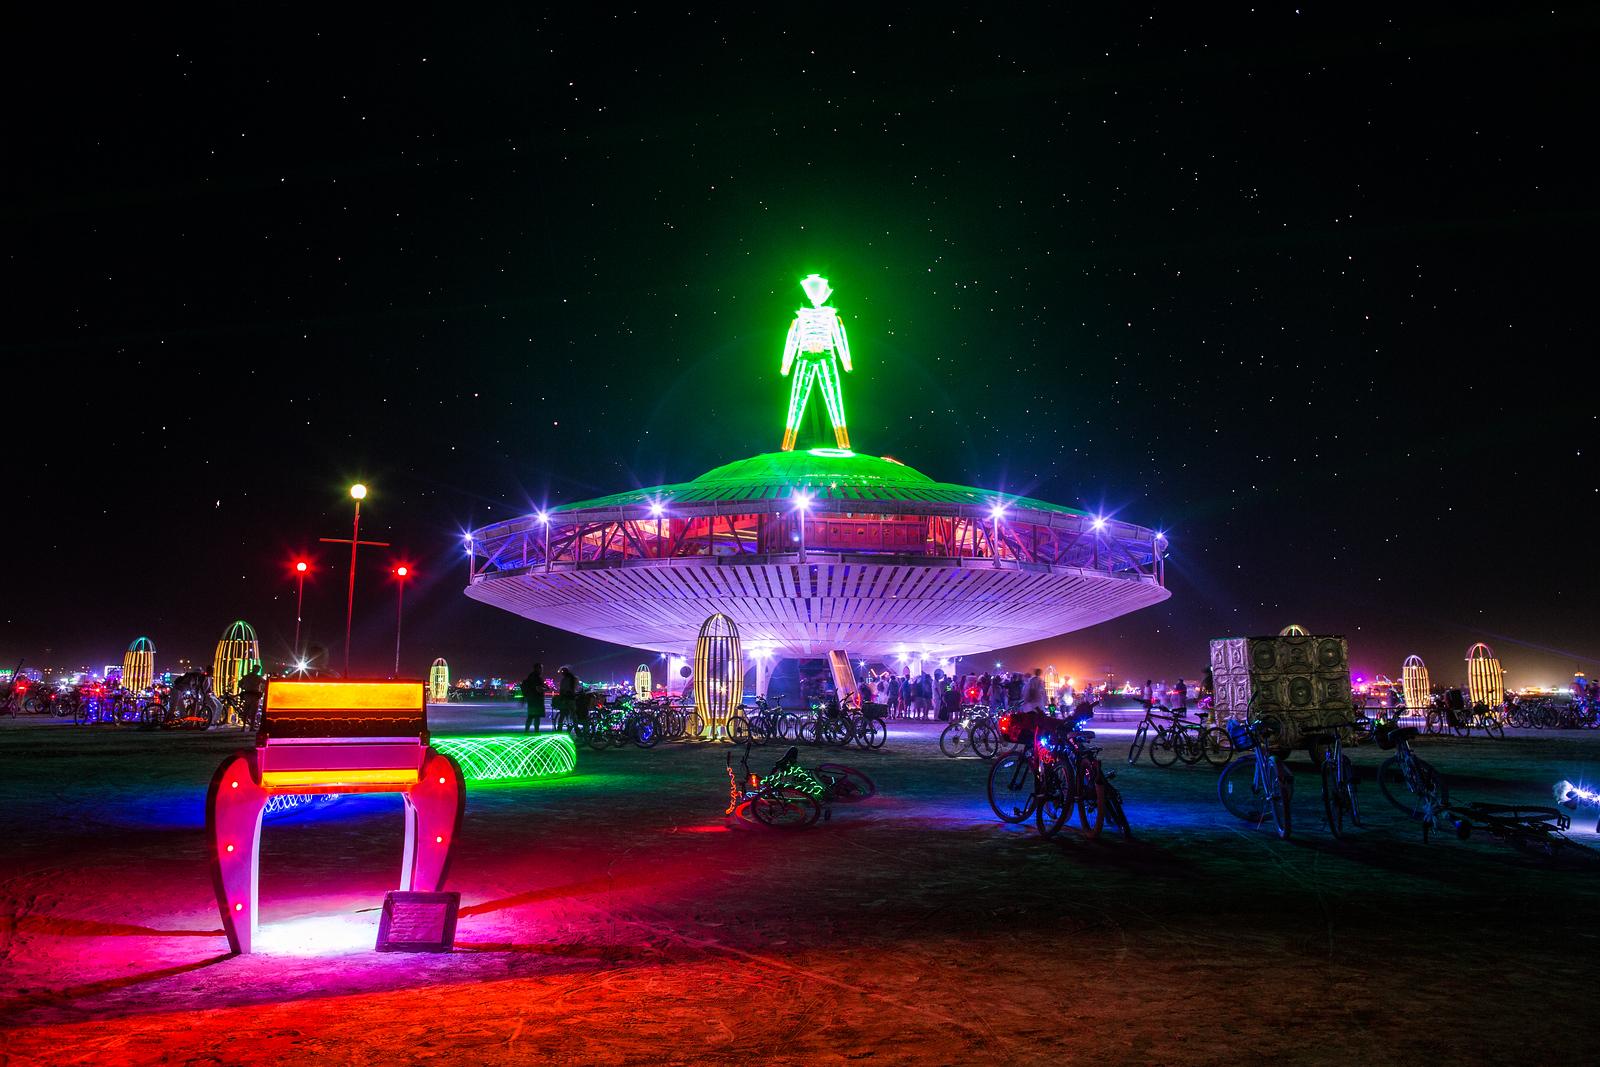 Alien Mothership on a Starry Night at Burning Man